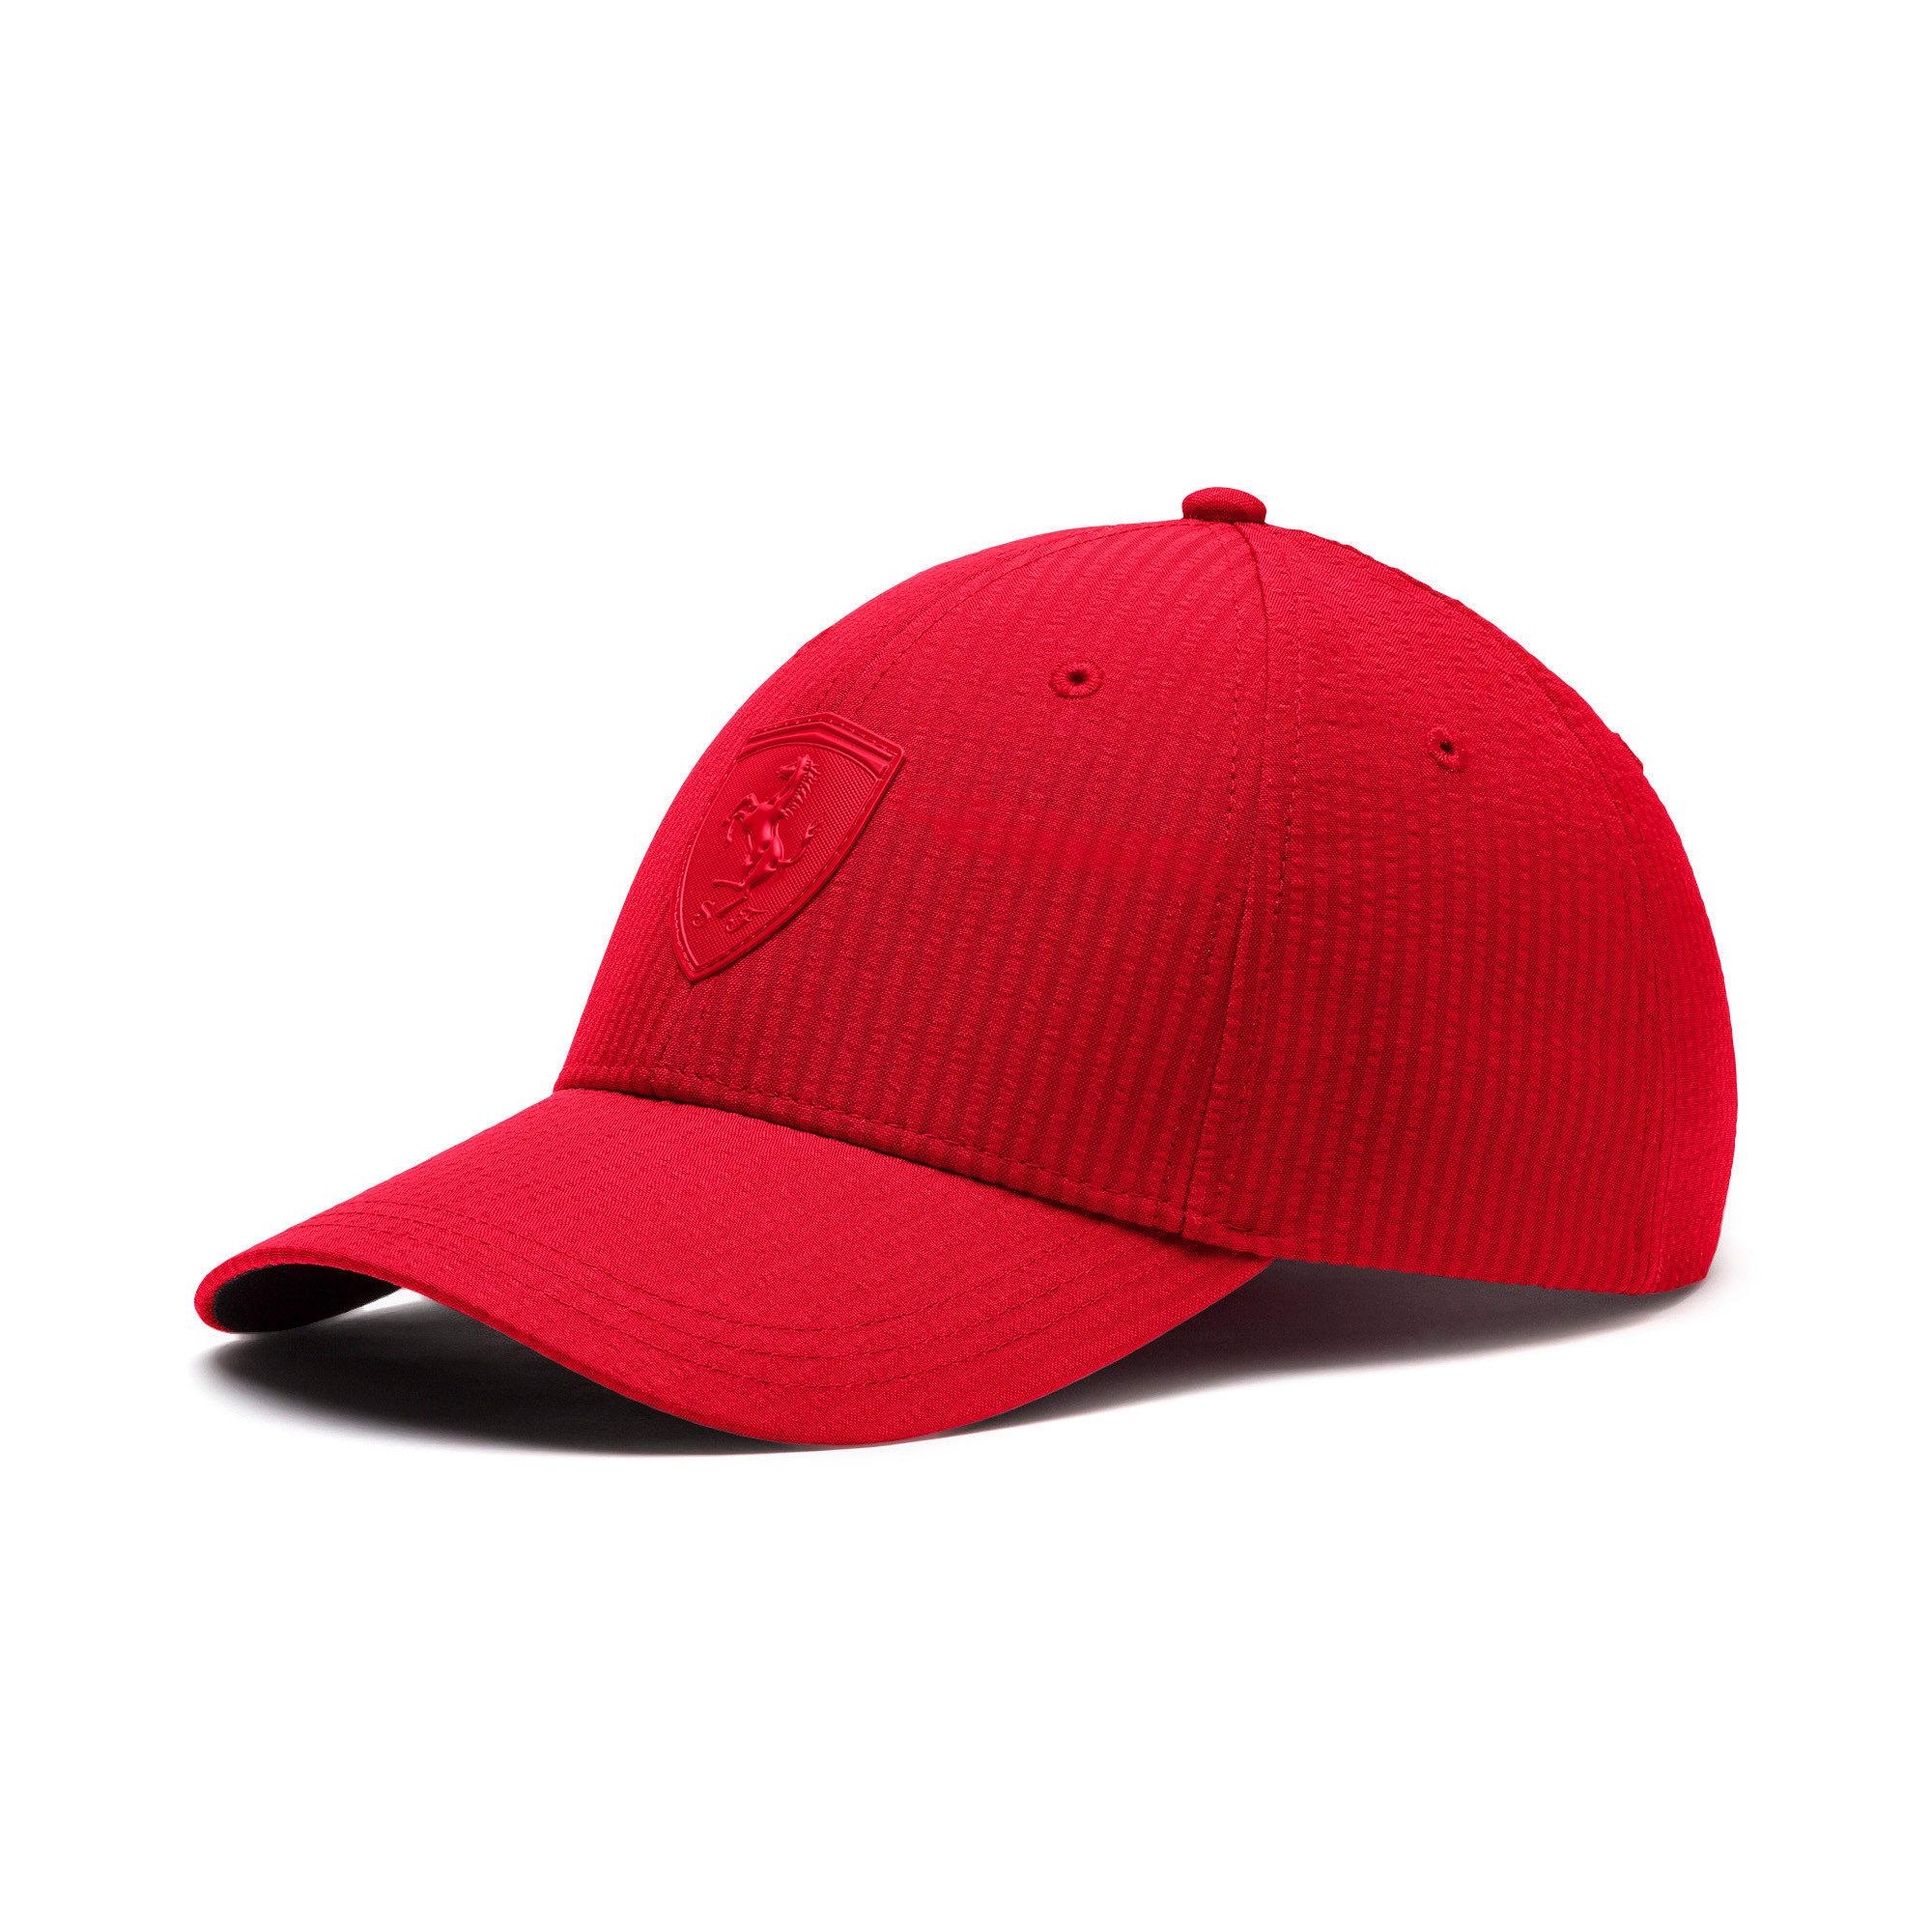 Thumbnail 1 of Ferrari Lifestyle Baseball Cap, Rosso Corsa, medium